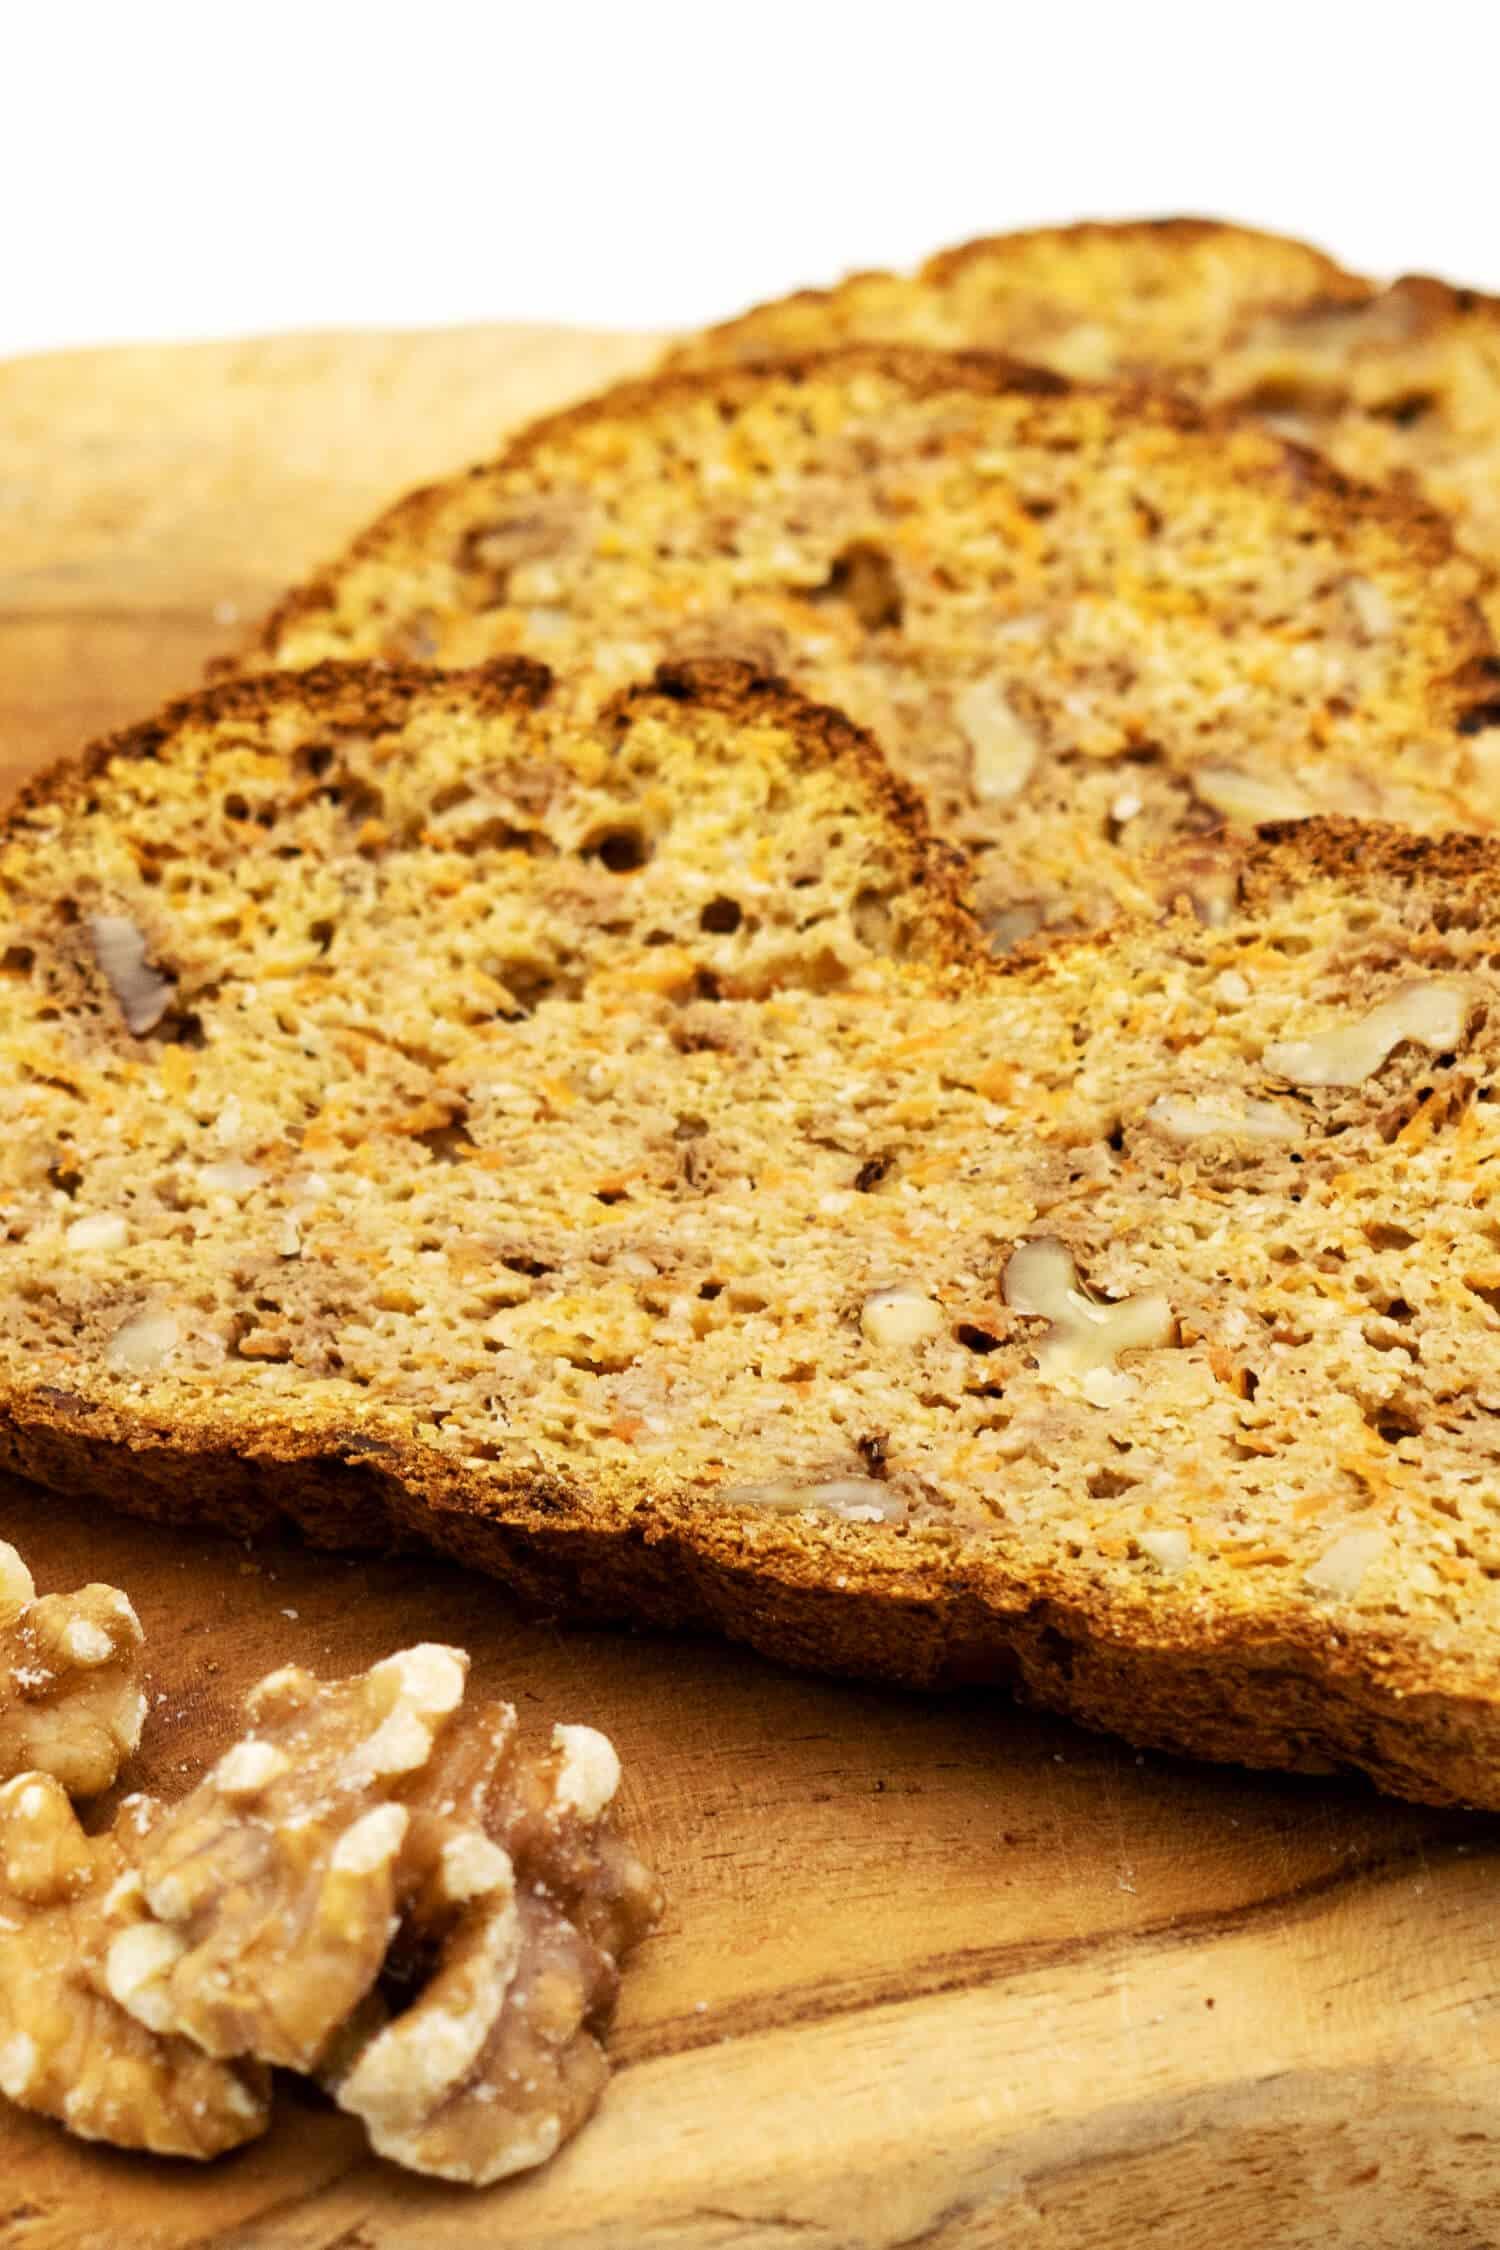 Möhren Walnuss Brot Rezept ohne Kohlenhydrate